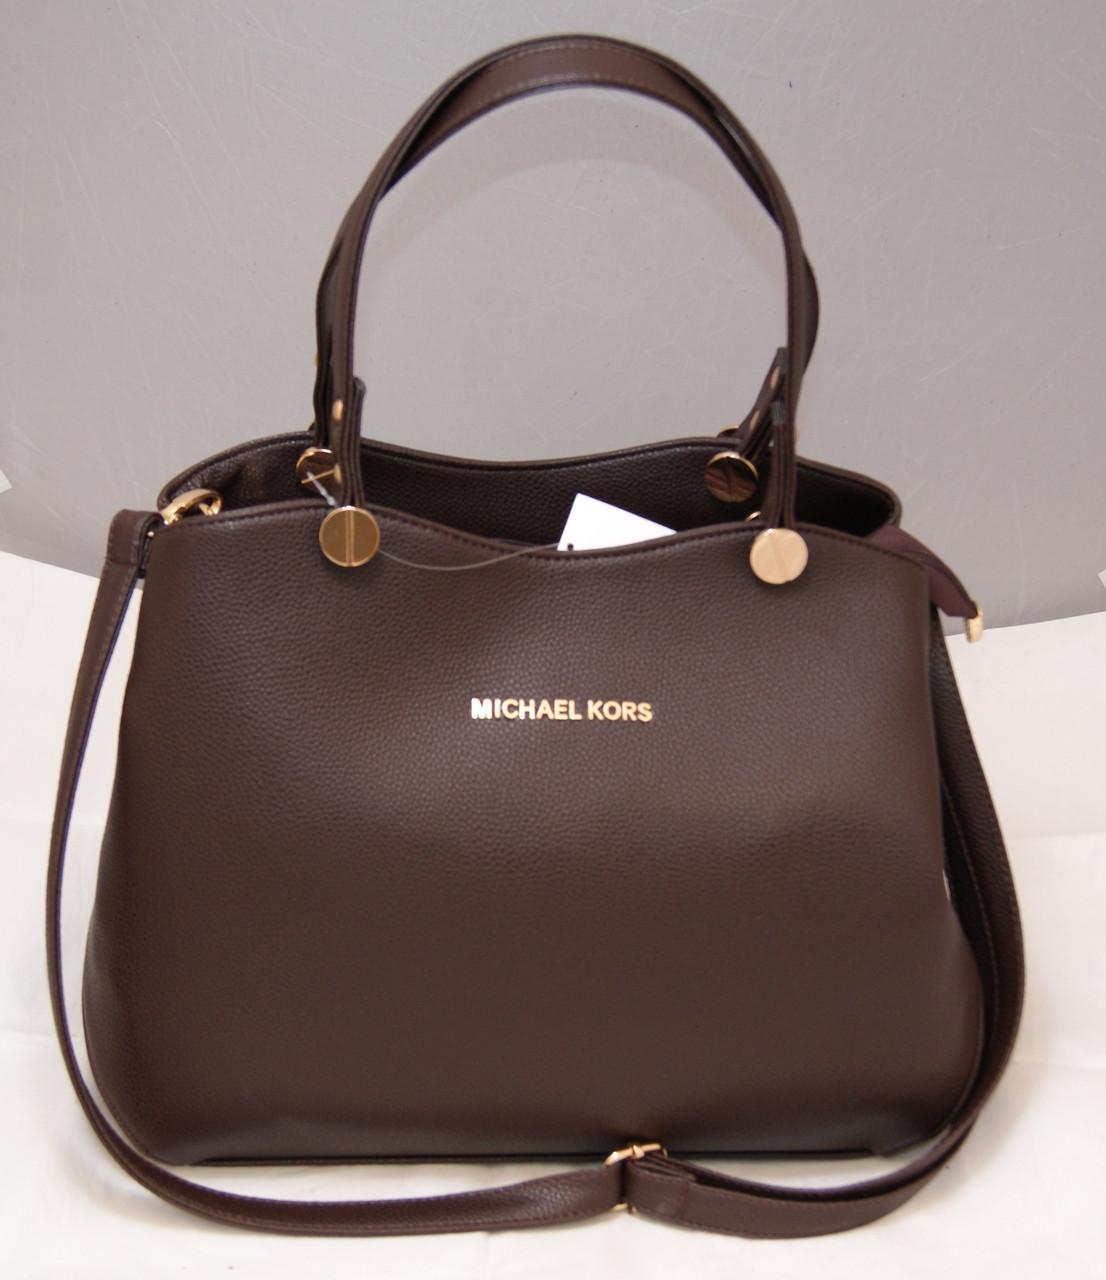 c5b39c49aa36 Женская сумка Michael Kors, цвет коричневый шоколад Майкл Корс MK .